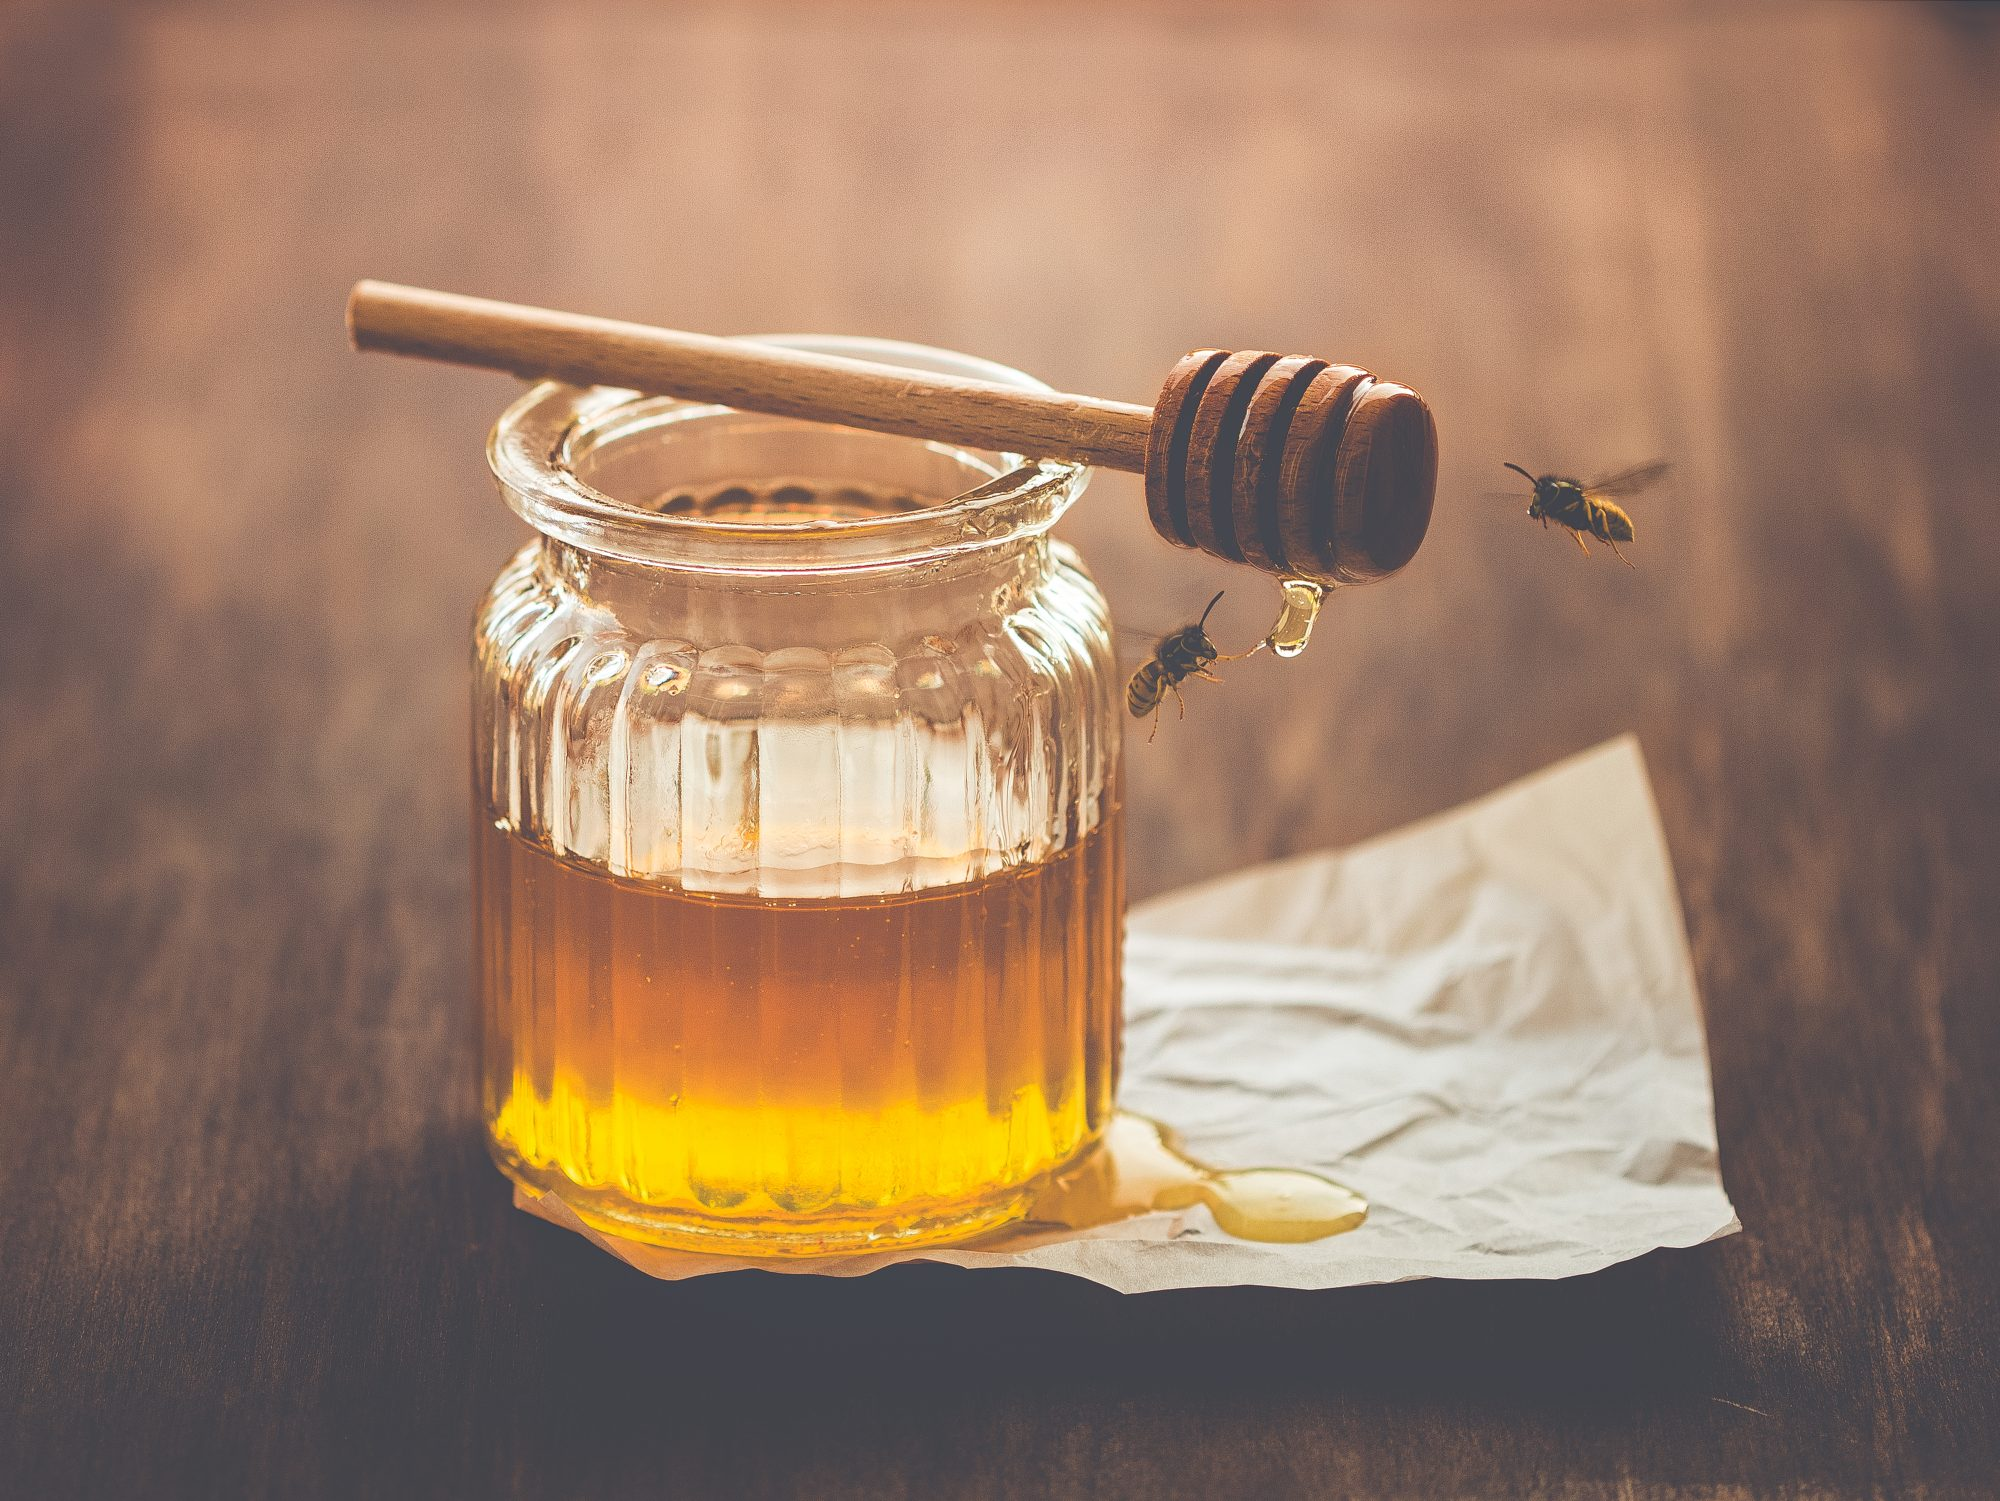 Honey tout Getty 9/21/20